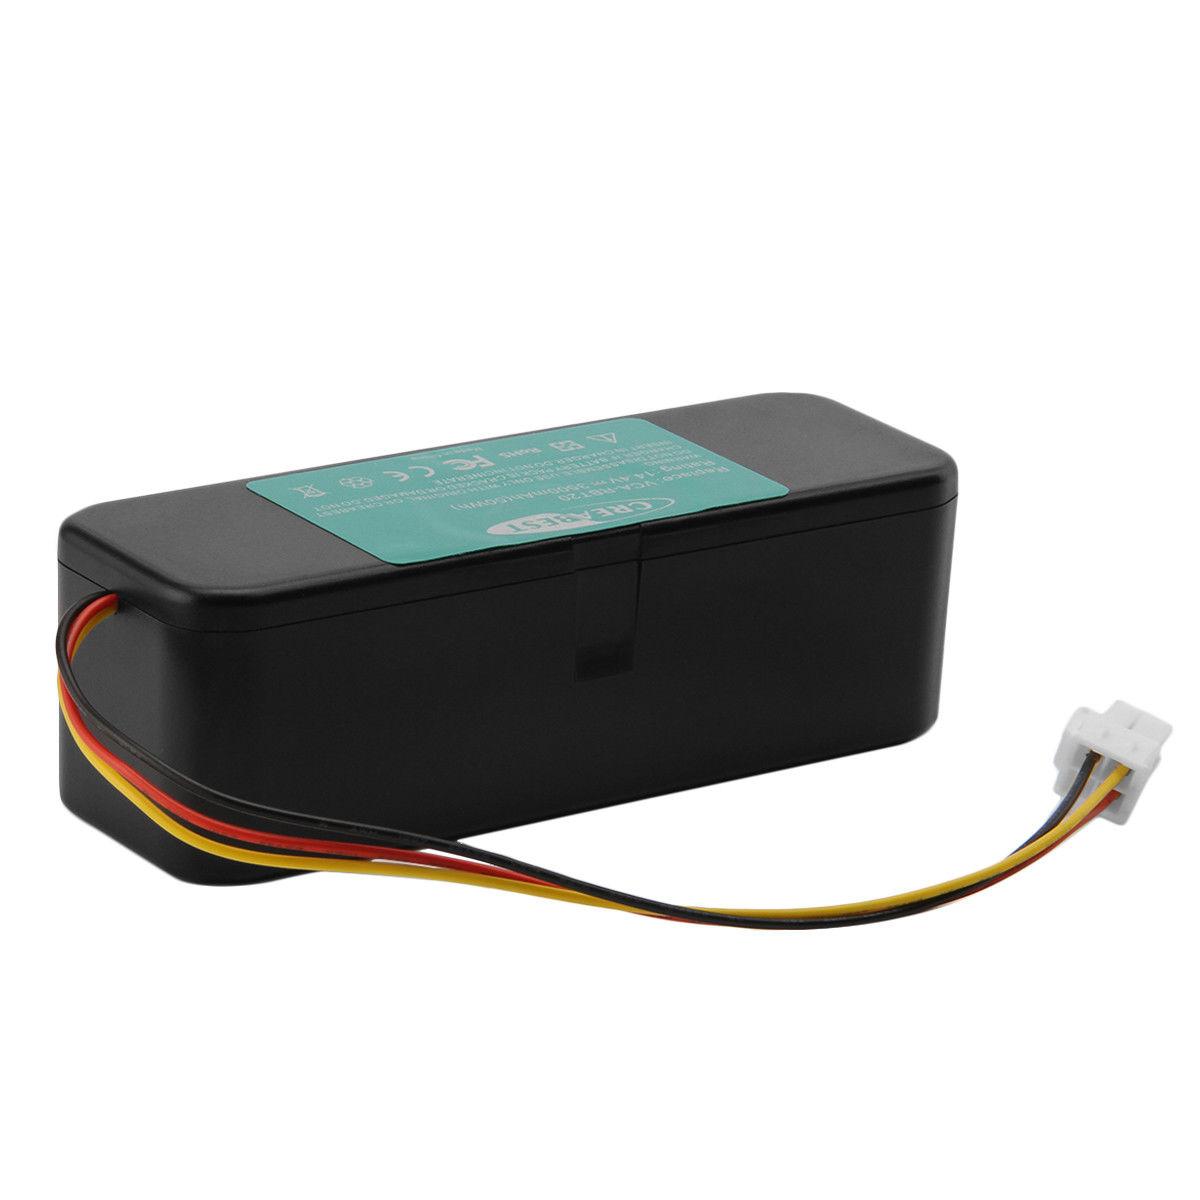 Batterie Samsung Navibot SR8990 / VCR8845 - VCA-RBT20 - 3,0Ah(compatible)